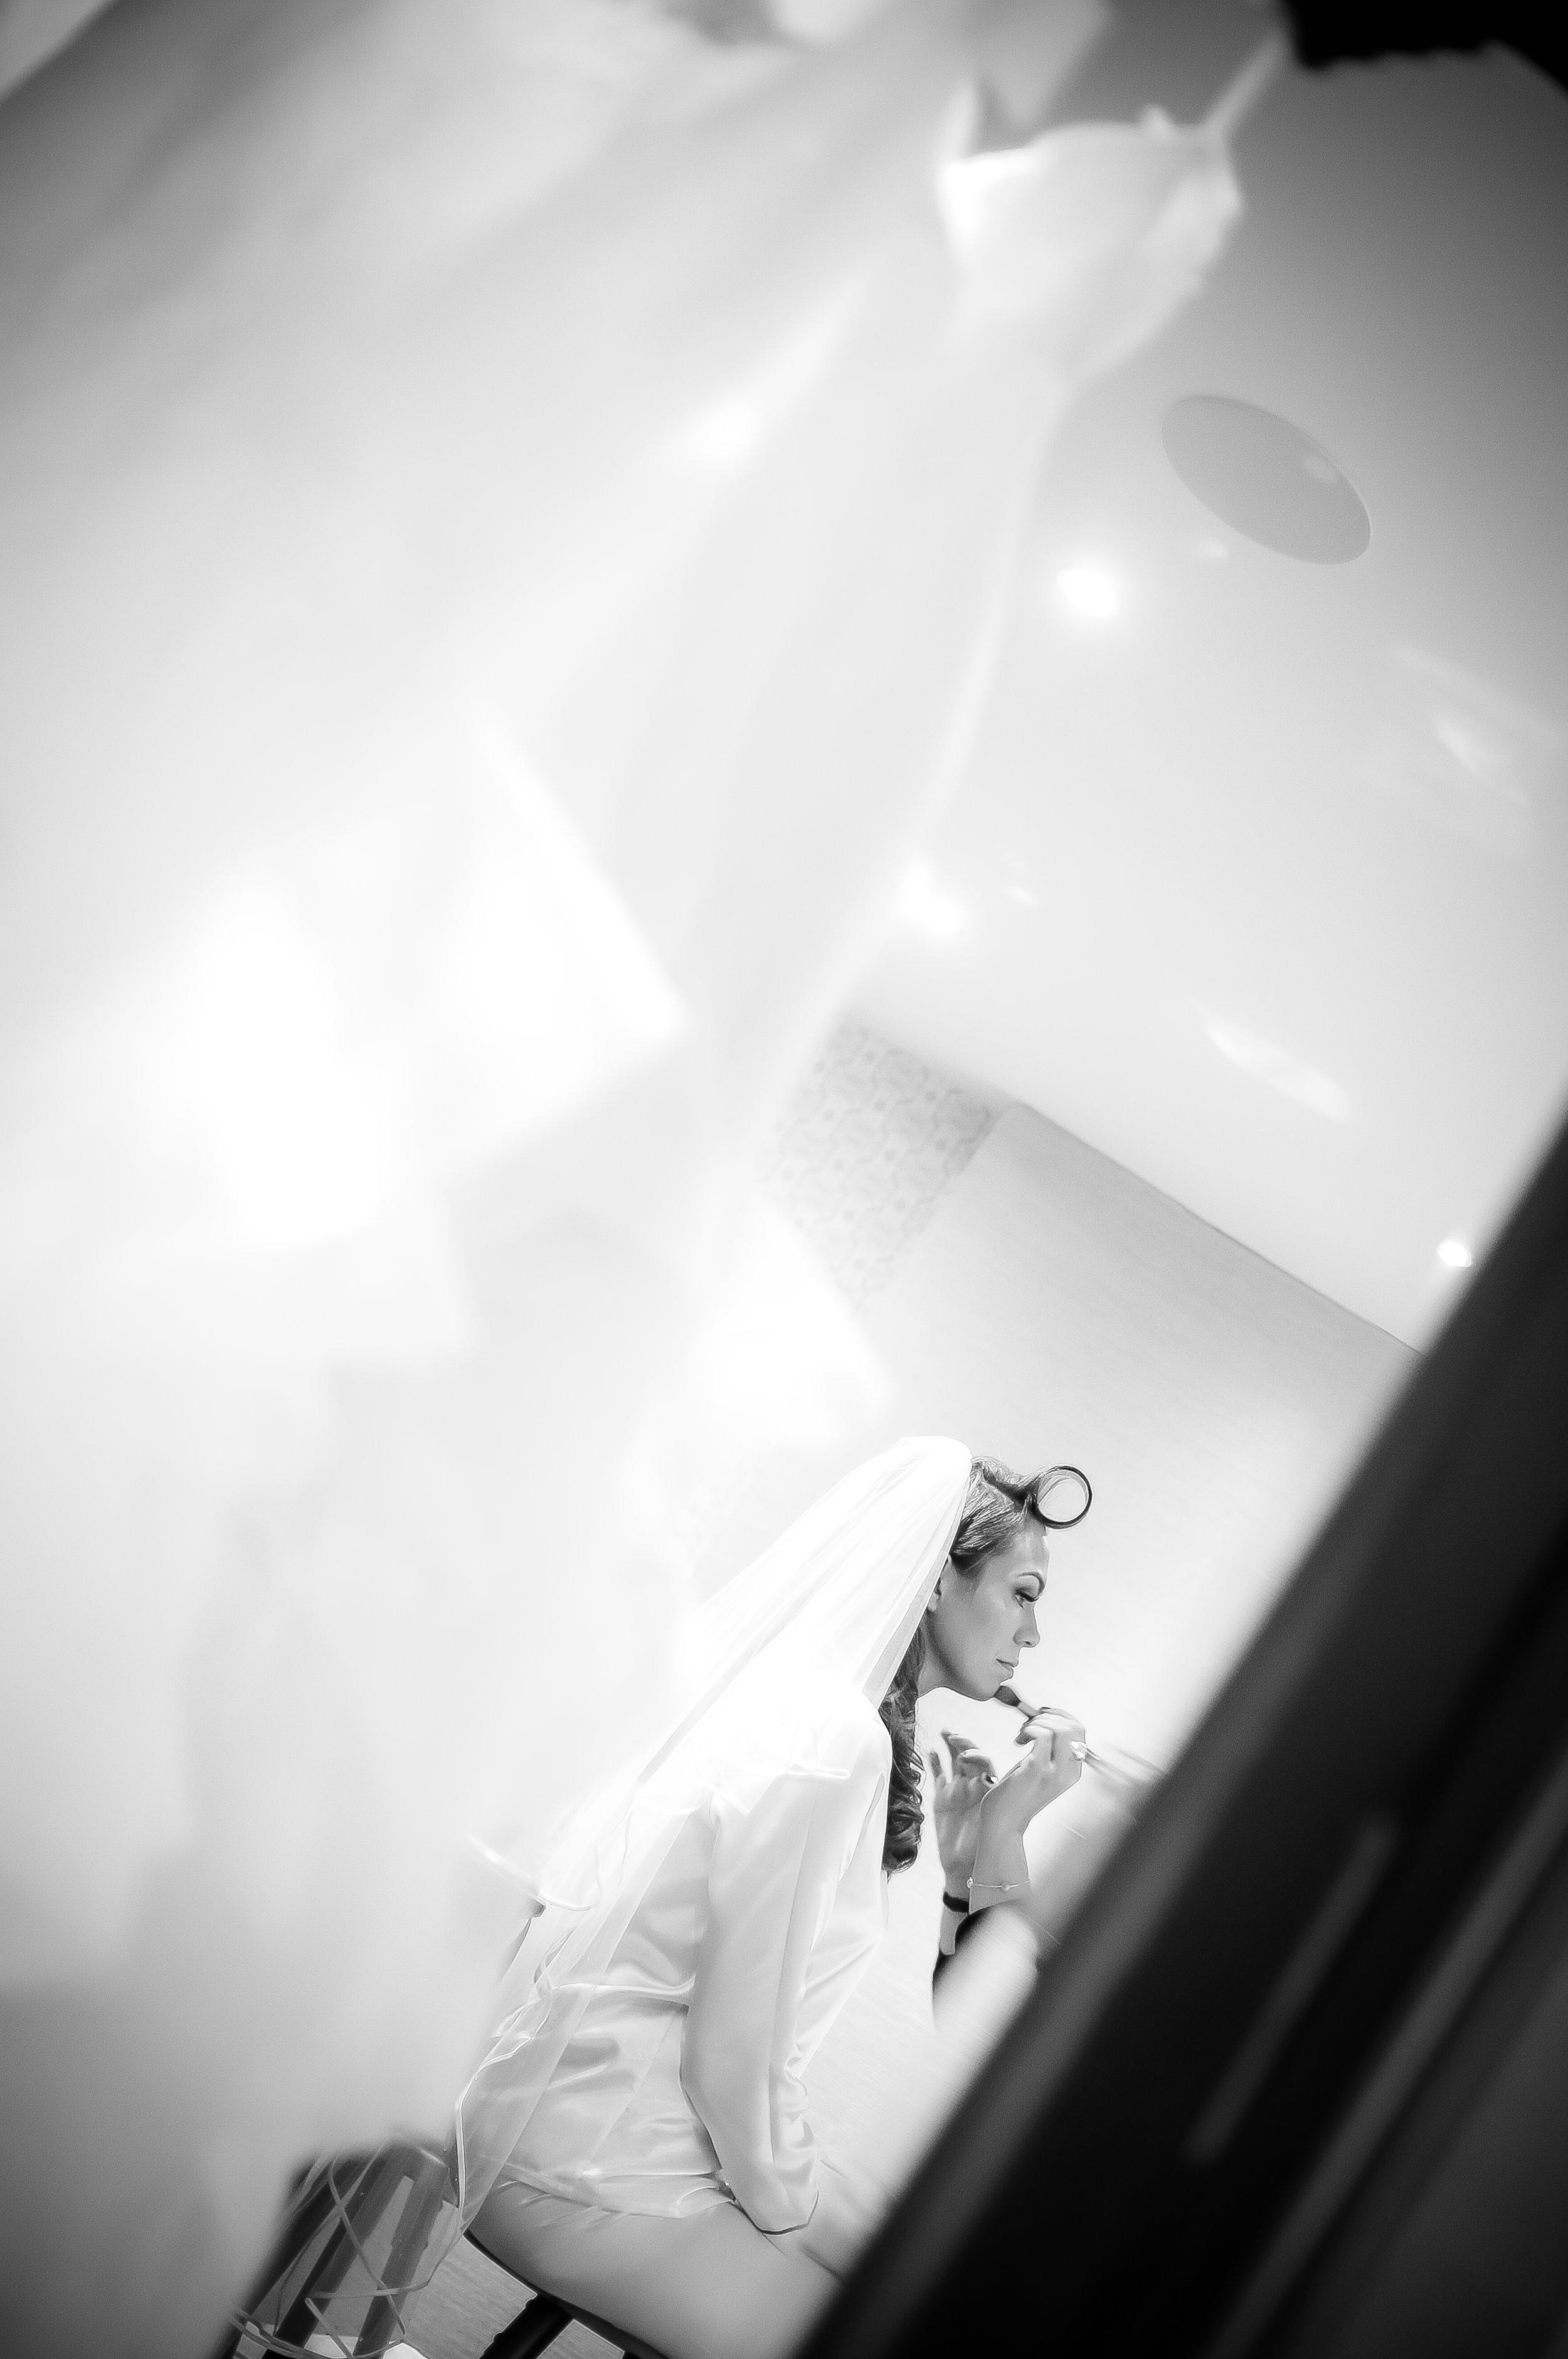 Weddings at the shankley hotel liverpool-1-4.jpg